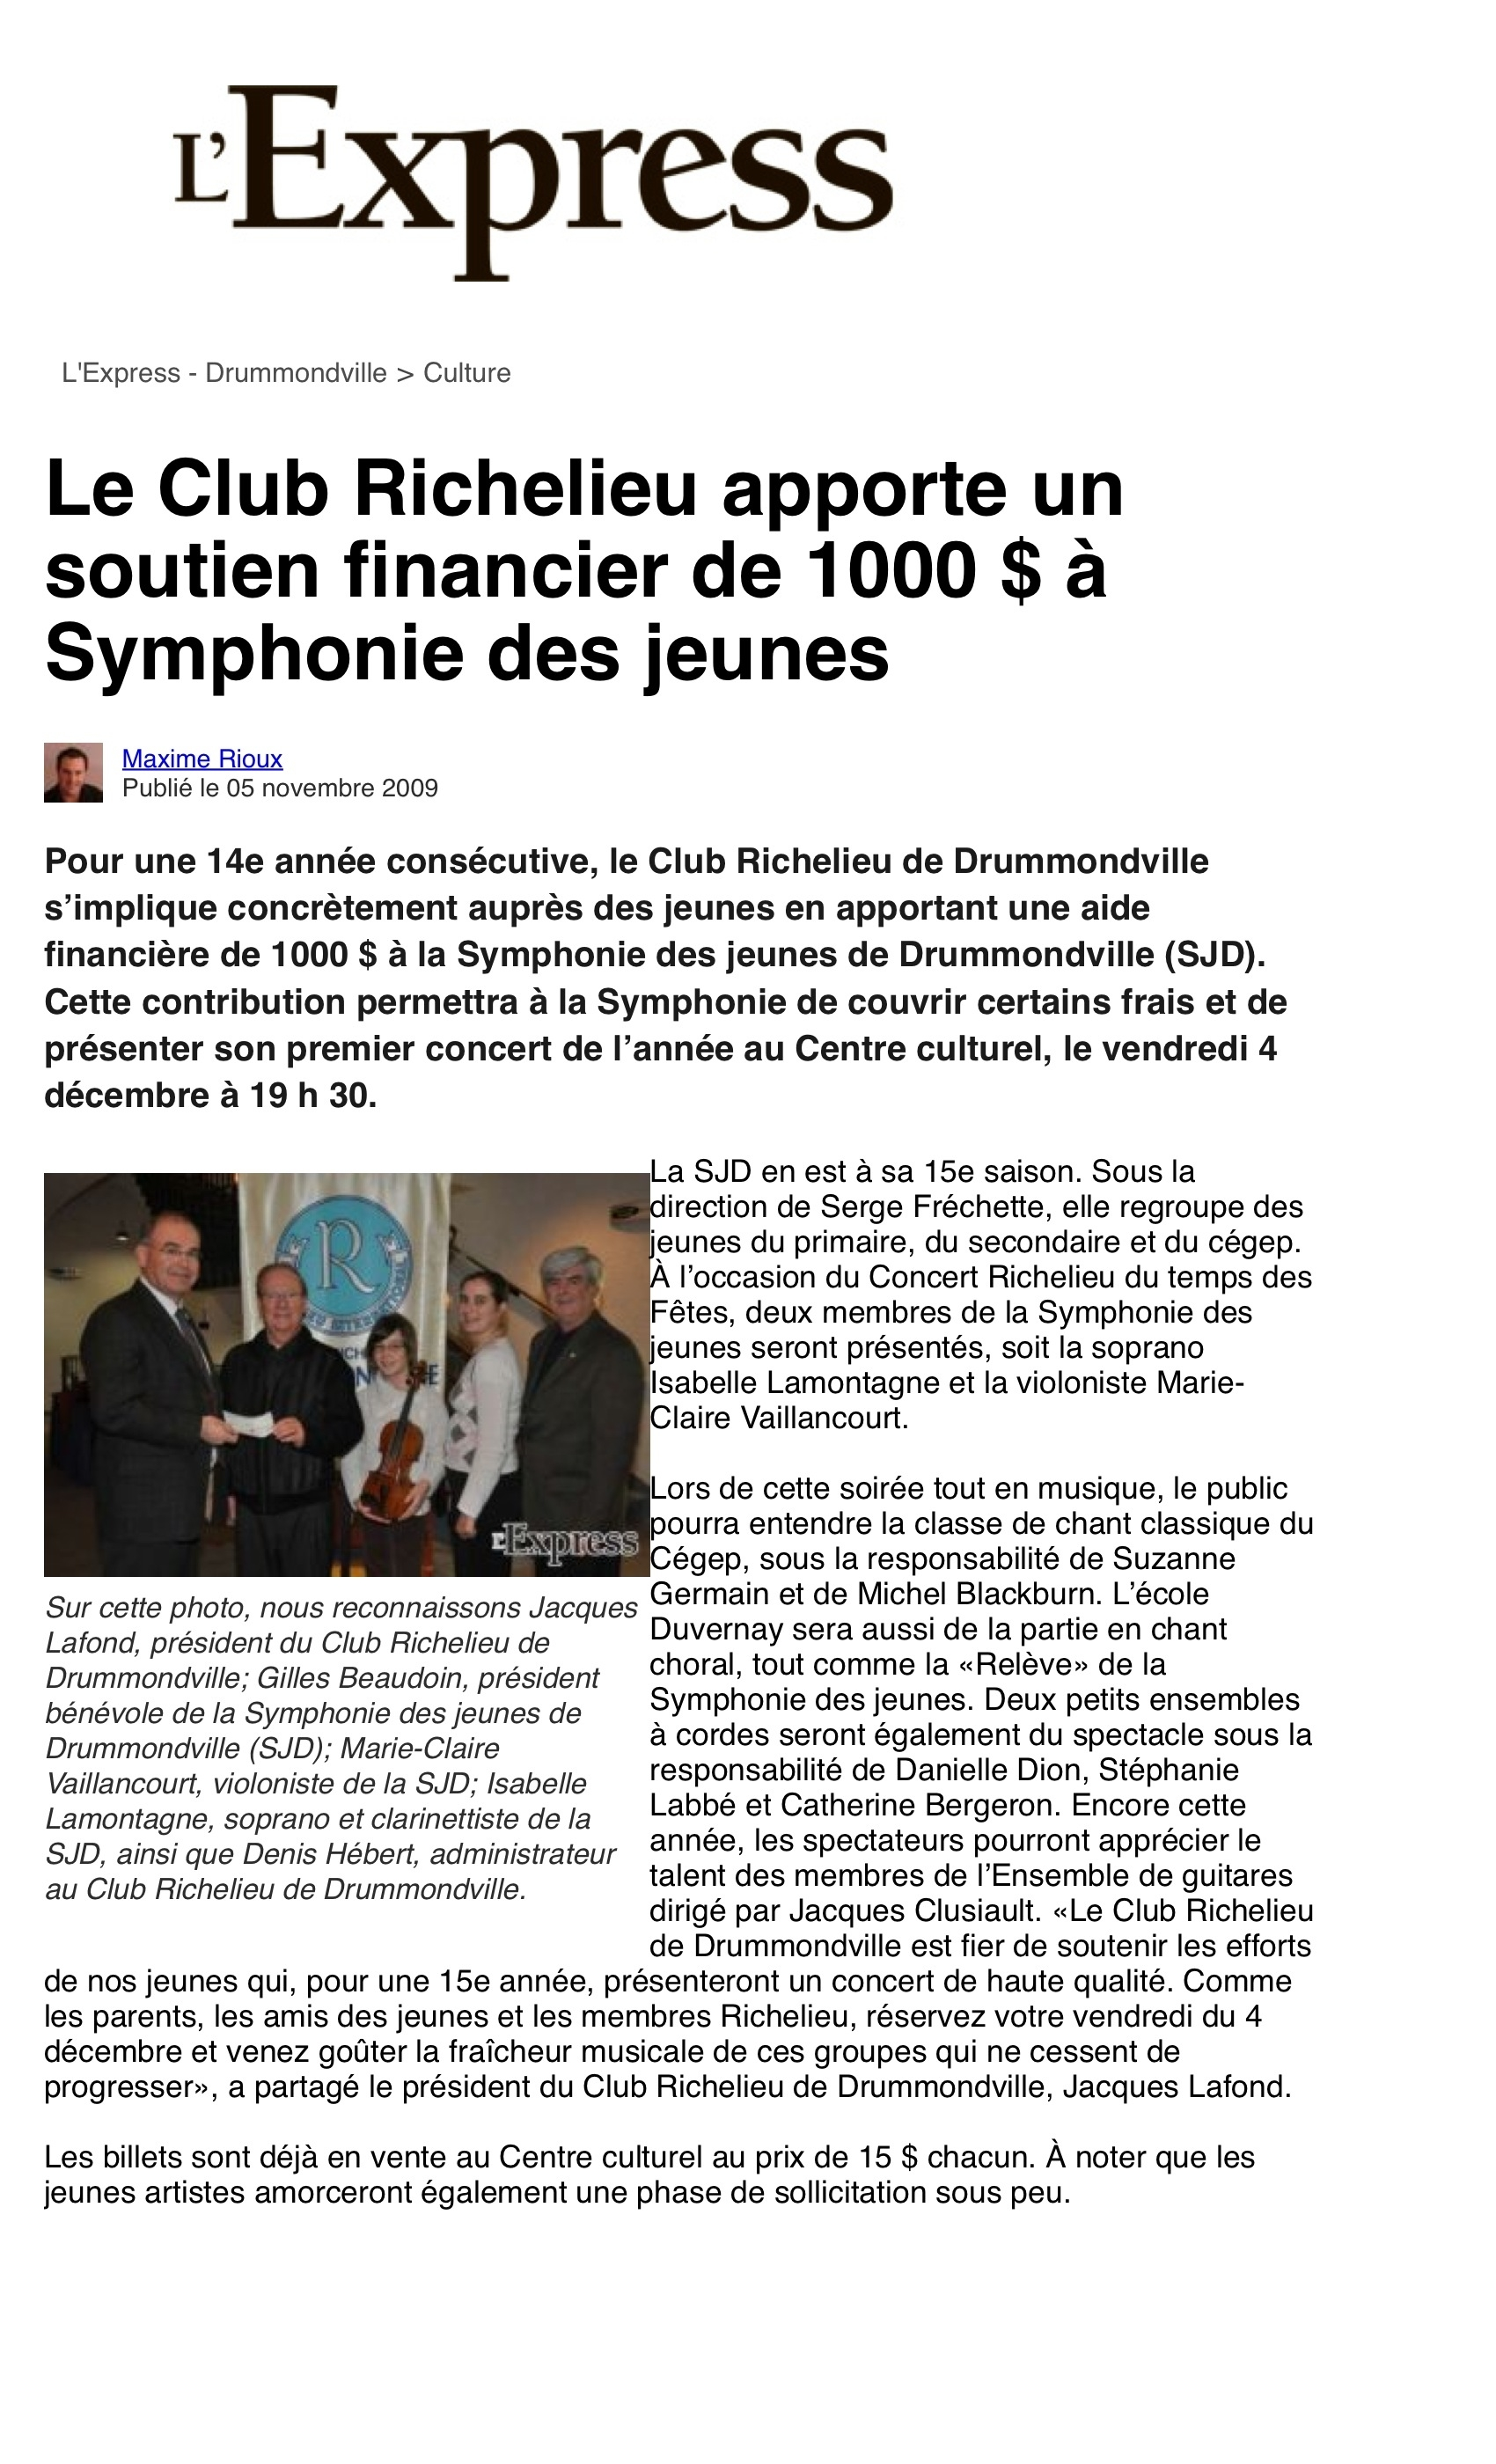 L'Express Drummondville, 5 novembre 2009